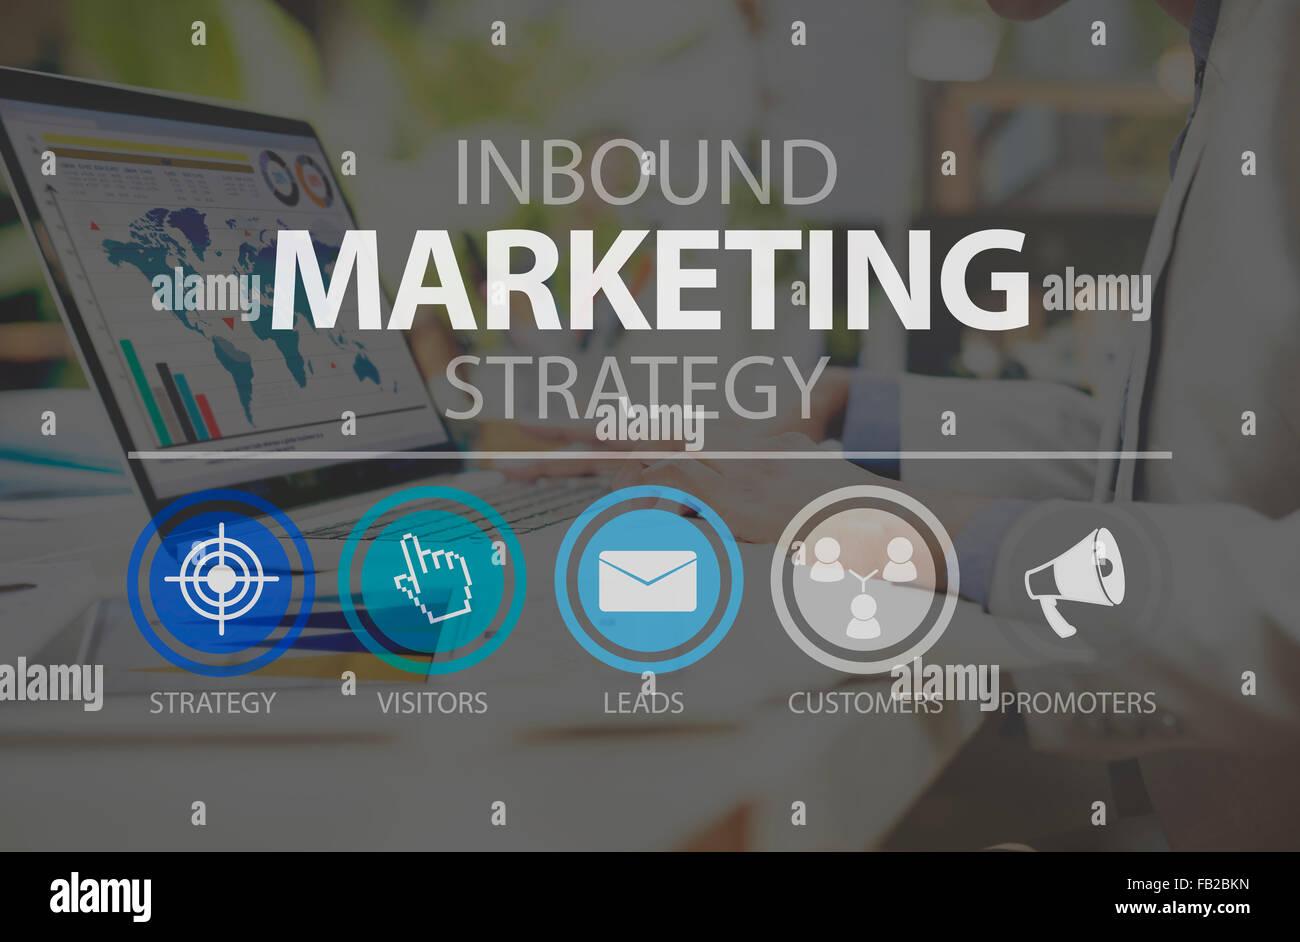 Inbound Marketingn Marketing Strategy Commerce Online Concept - Stock Image